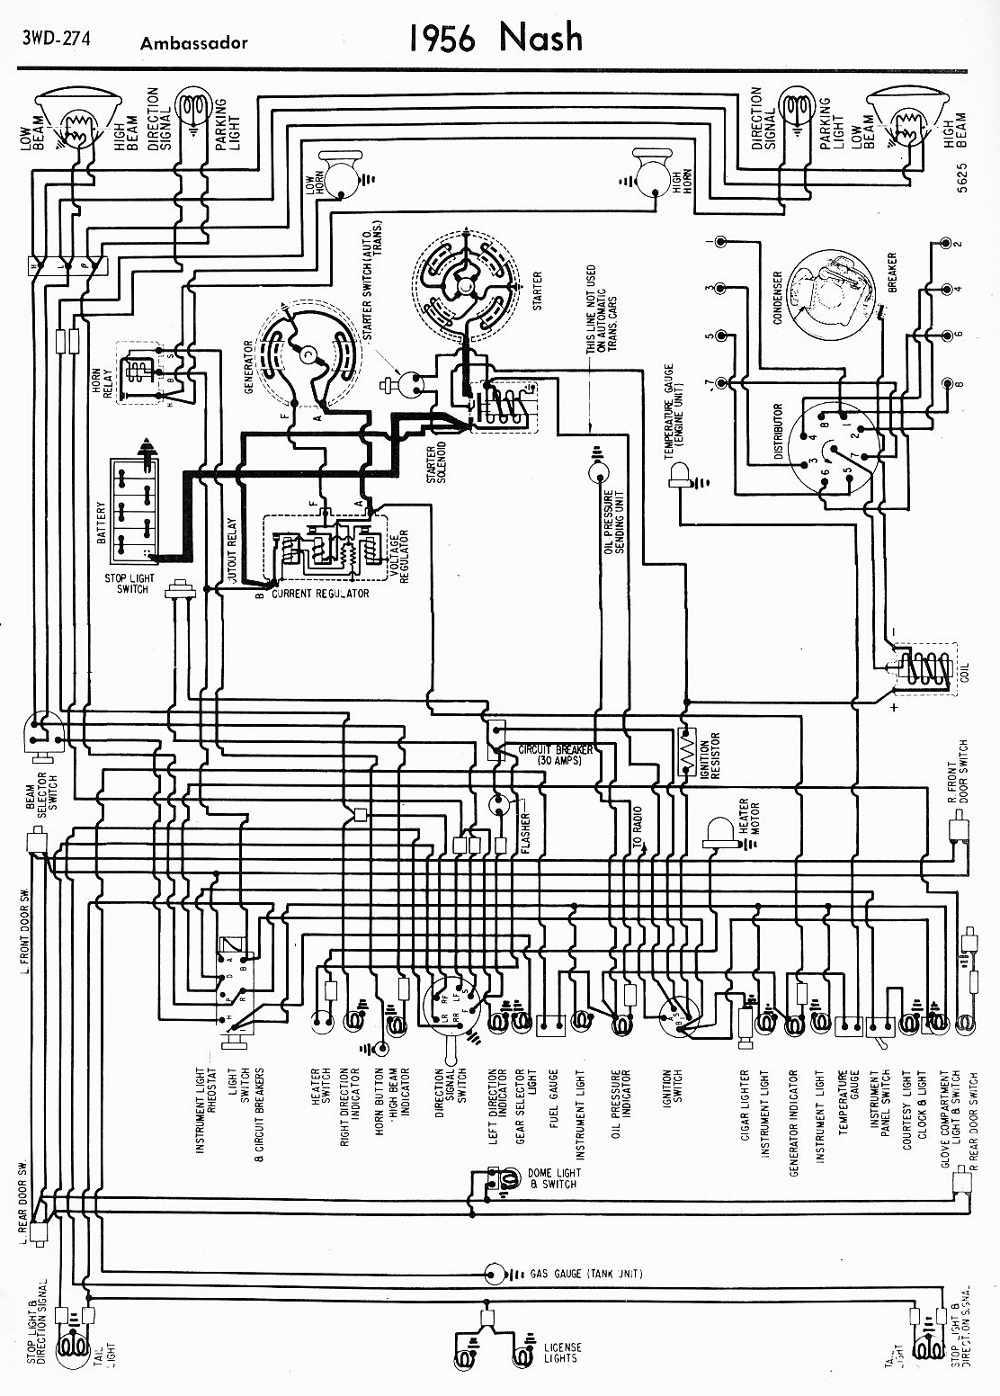 wiring-diagrams-of-1956-nash-ambador Wiring Diagram For Nash Metropolitan on back seat, convertible blue, car clubs, hood ornament, pic custom, cars sale, street rod, parts car, drag cars,